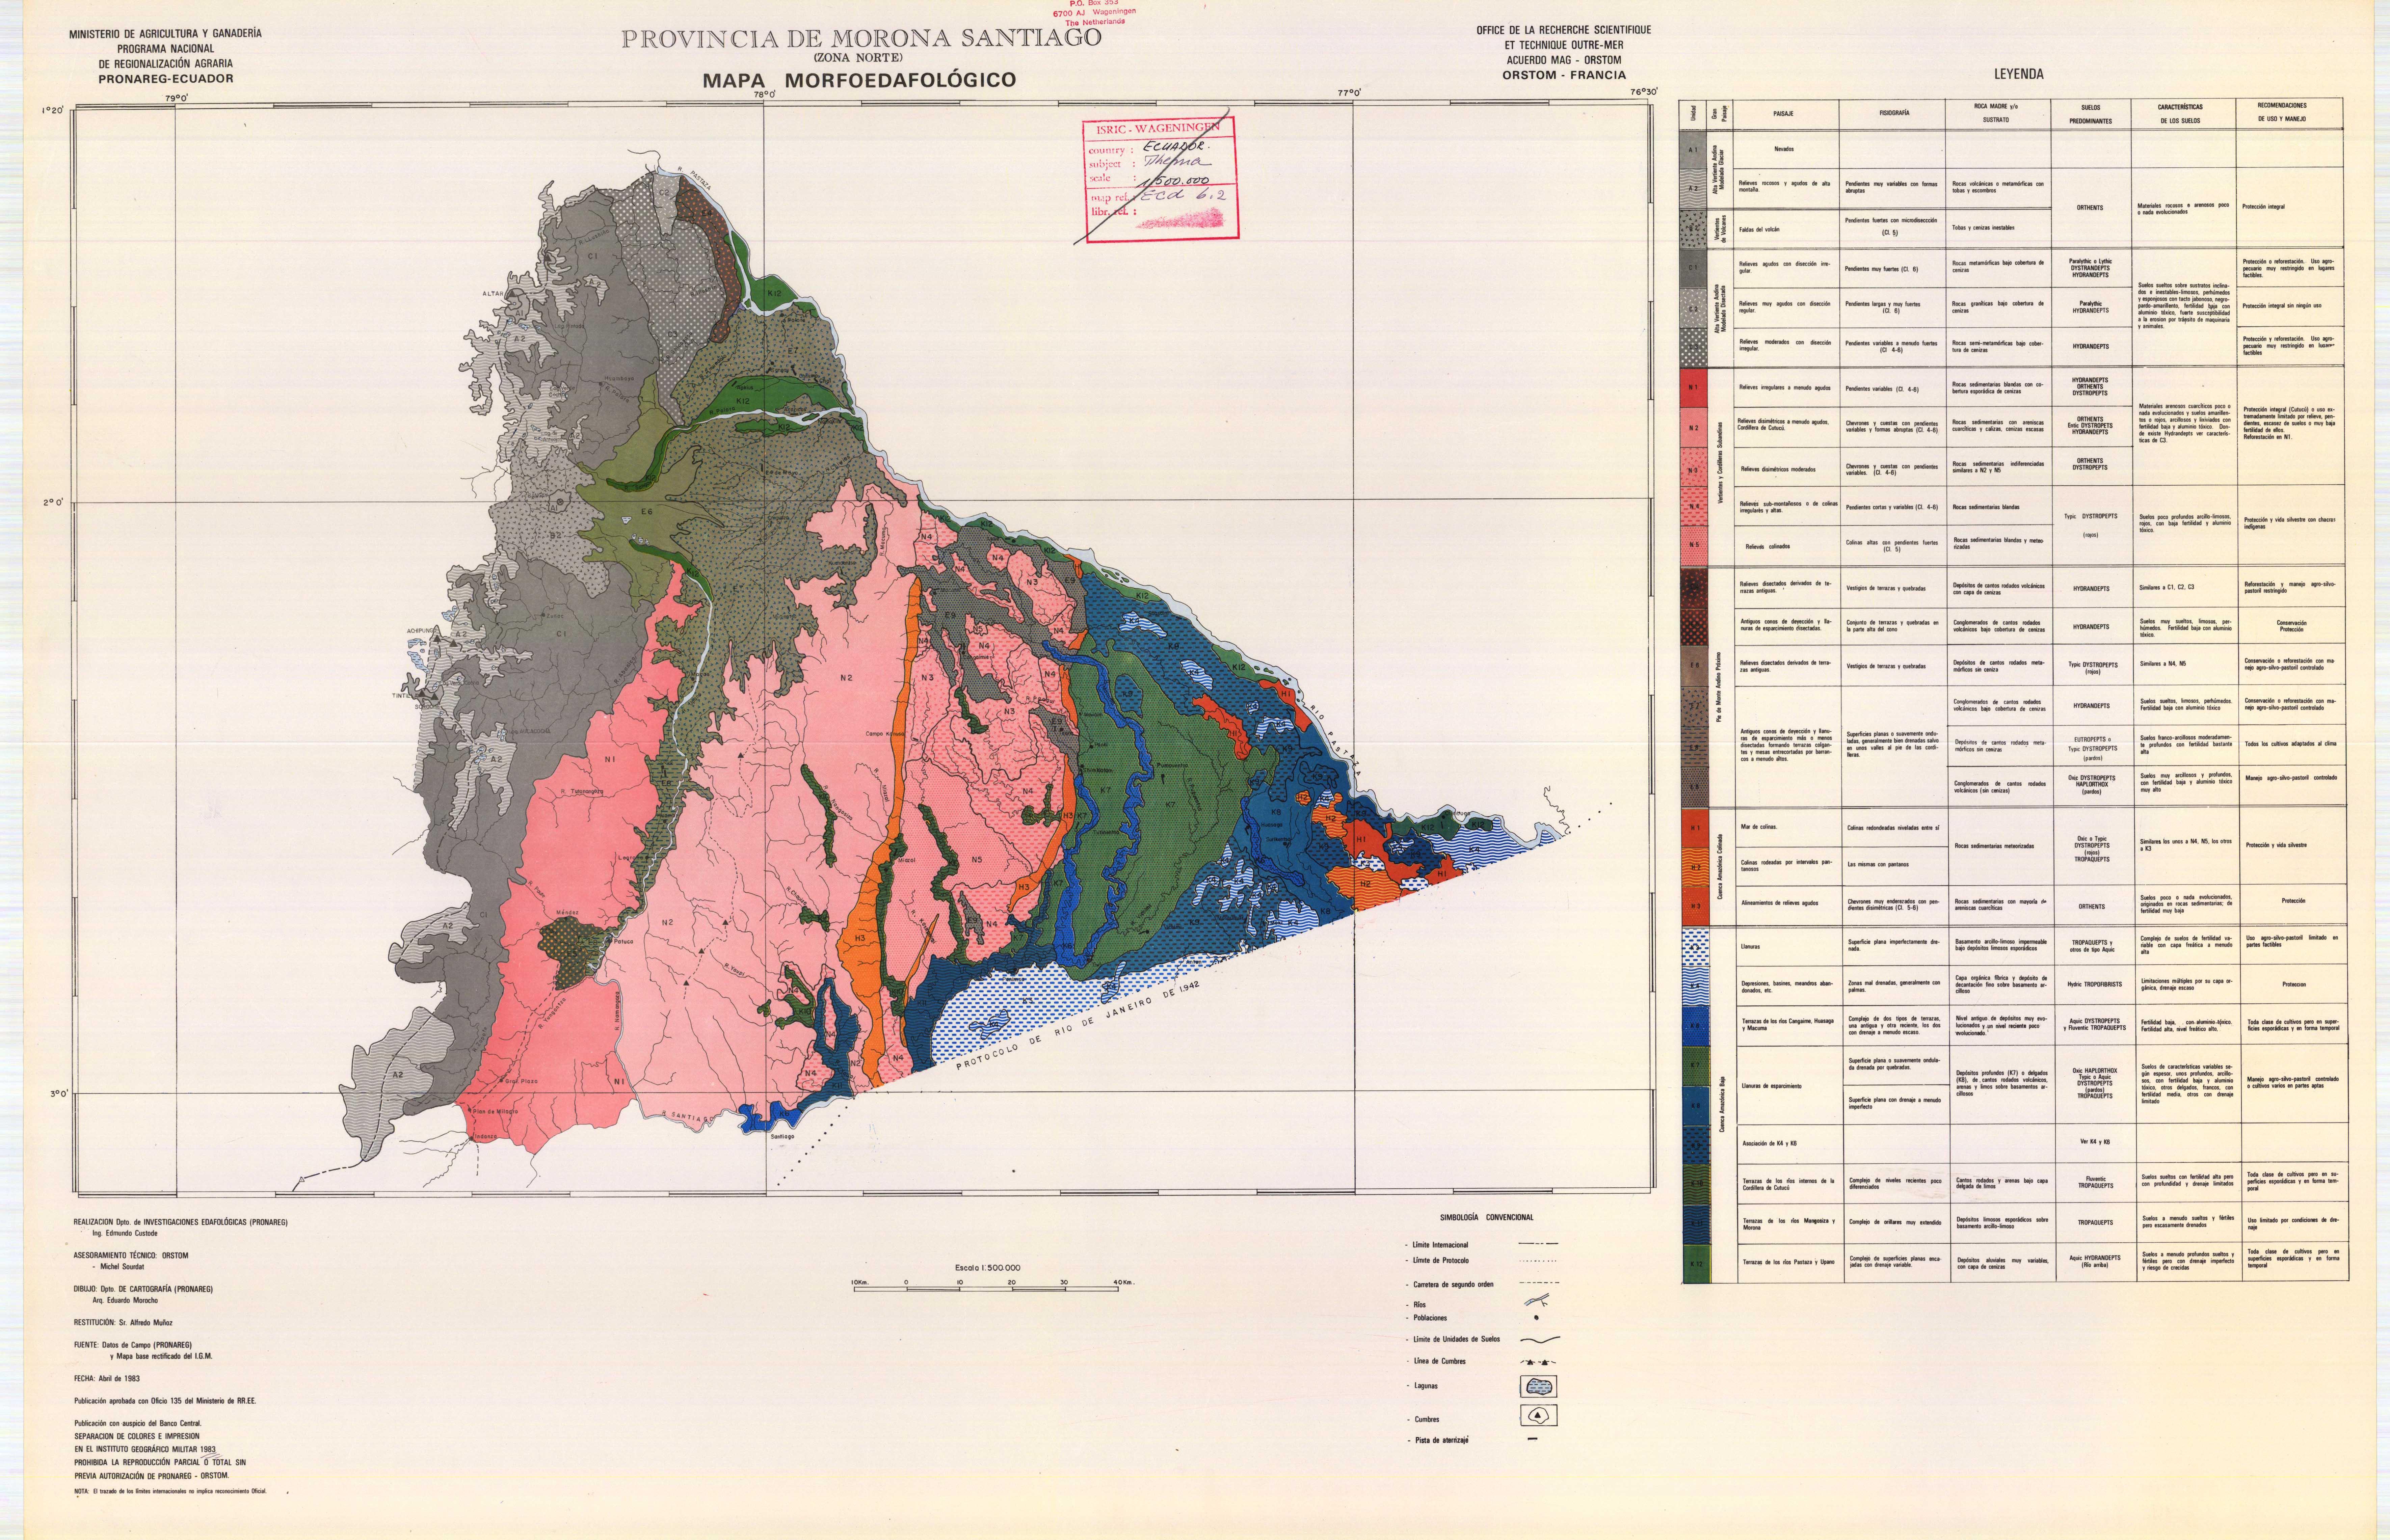 Morpho-edaphological map of Morona Santiago (northern area) 1983